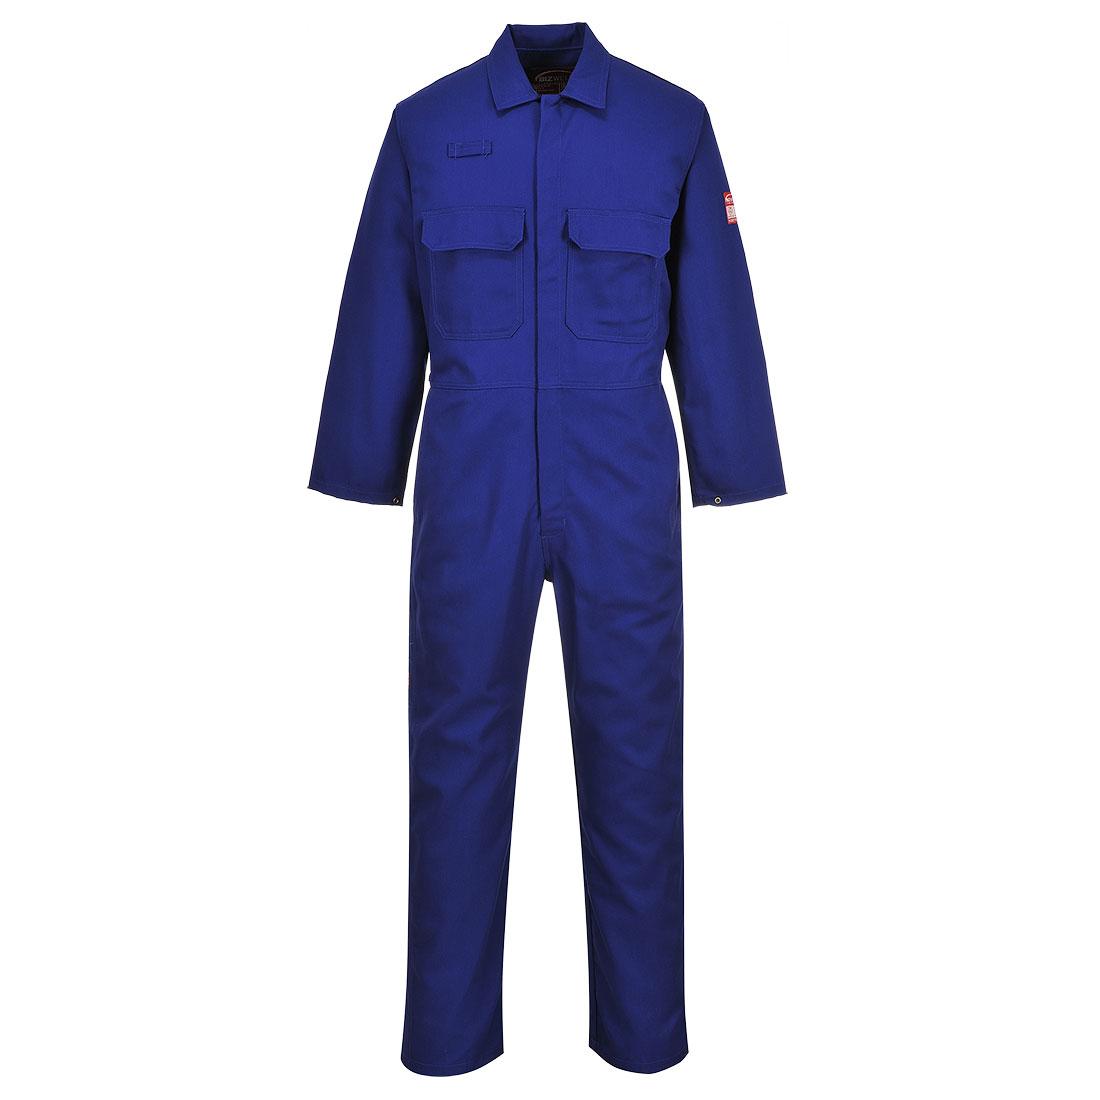 BizWeld Boilersuit Royal Blue XLR